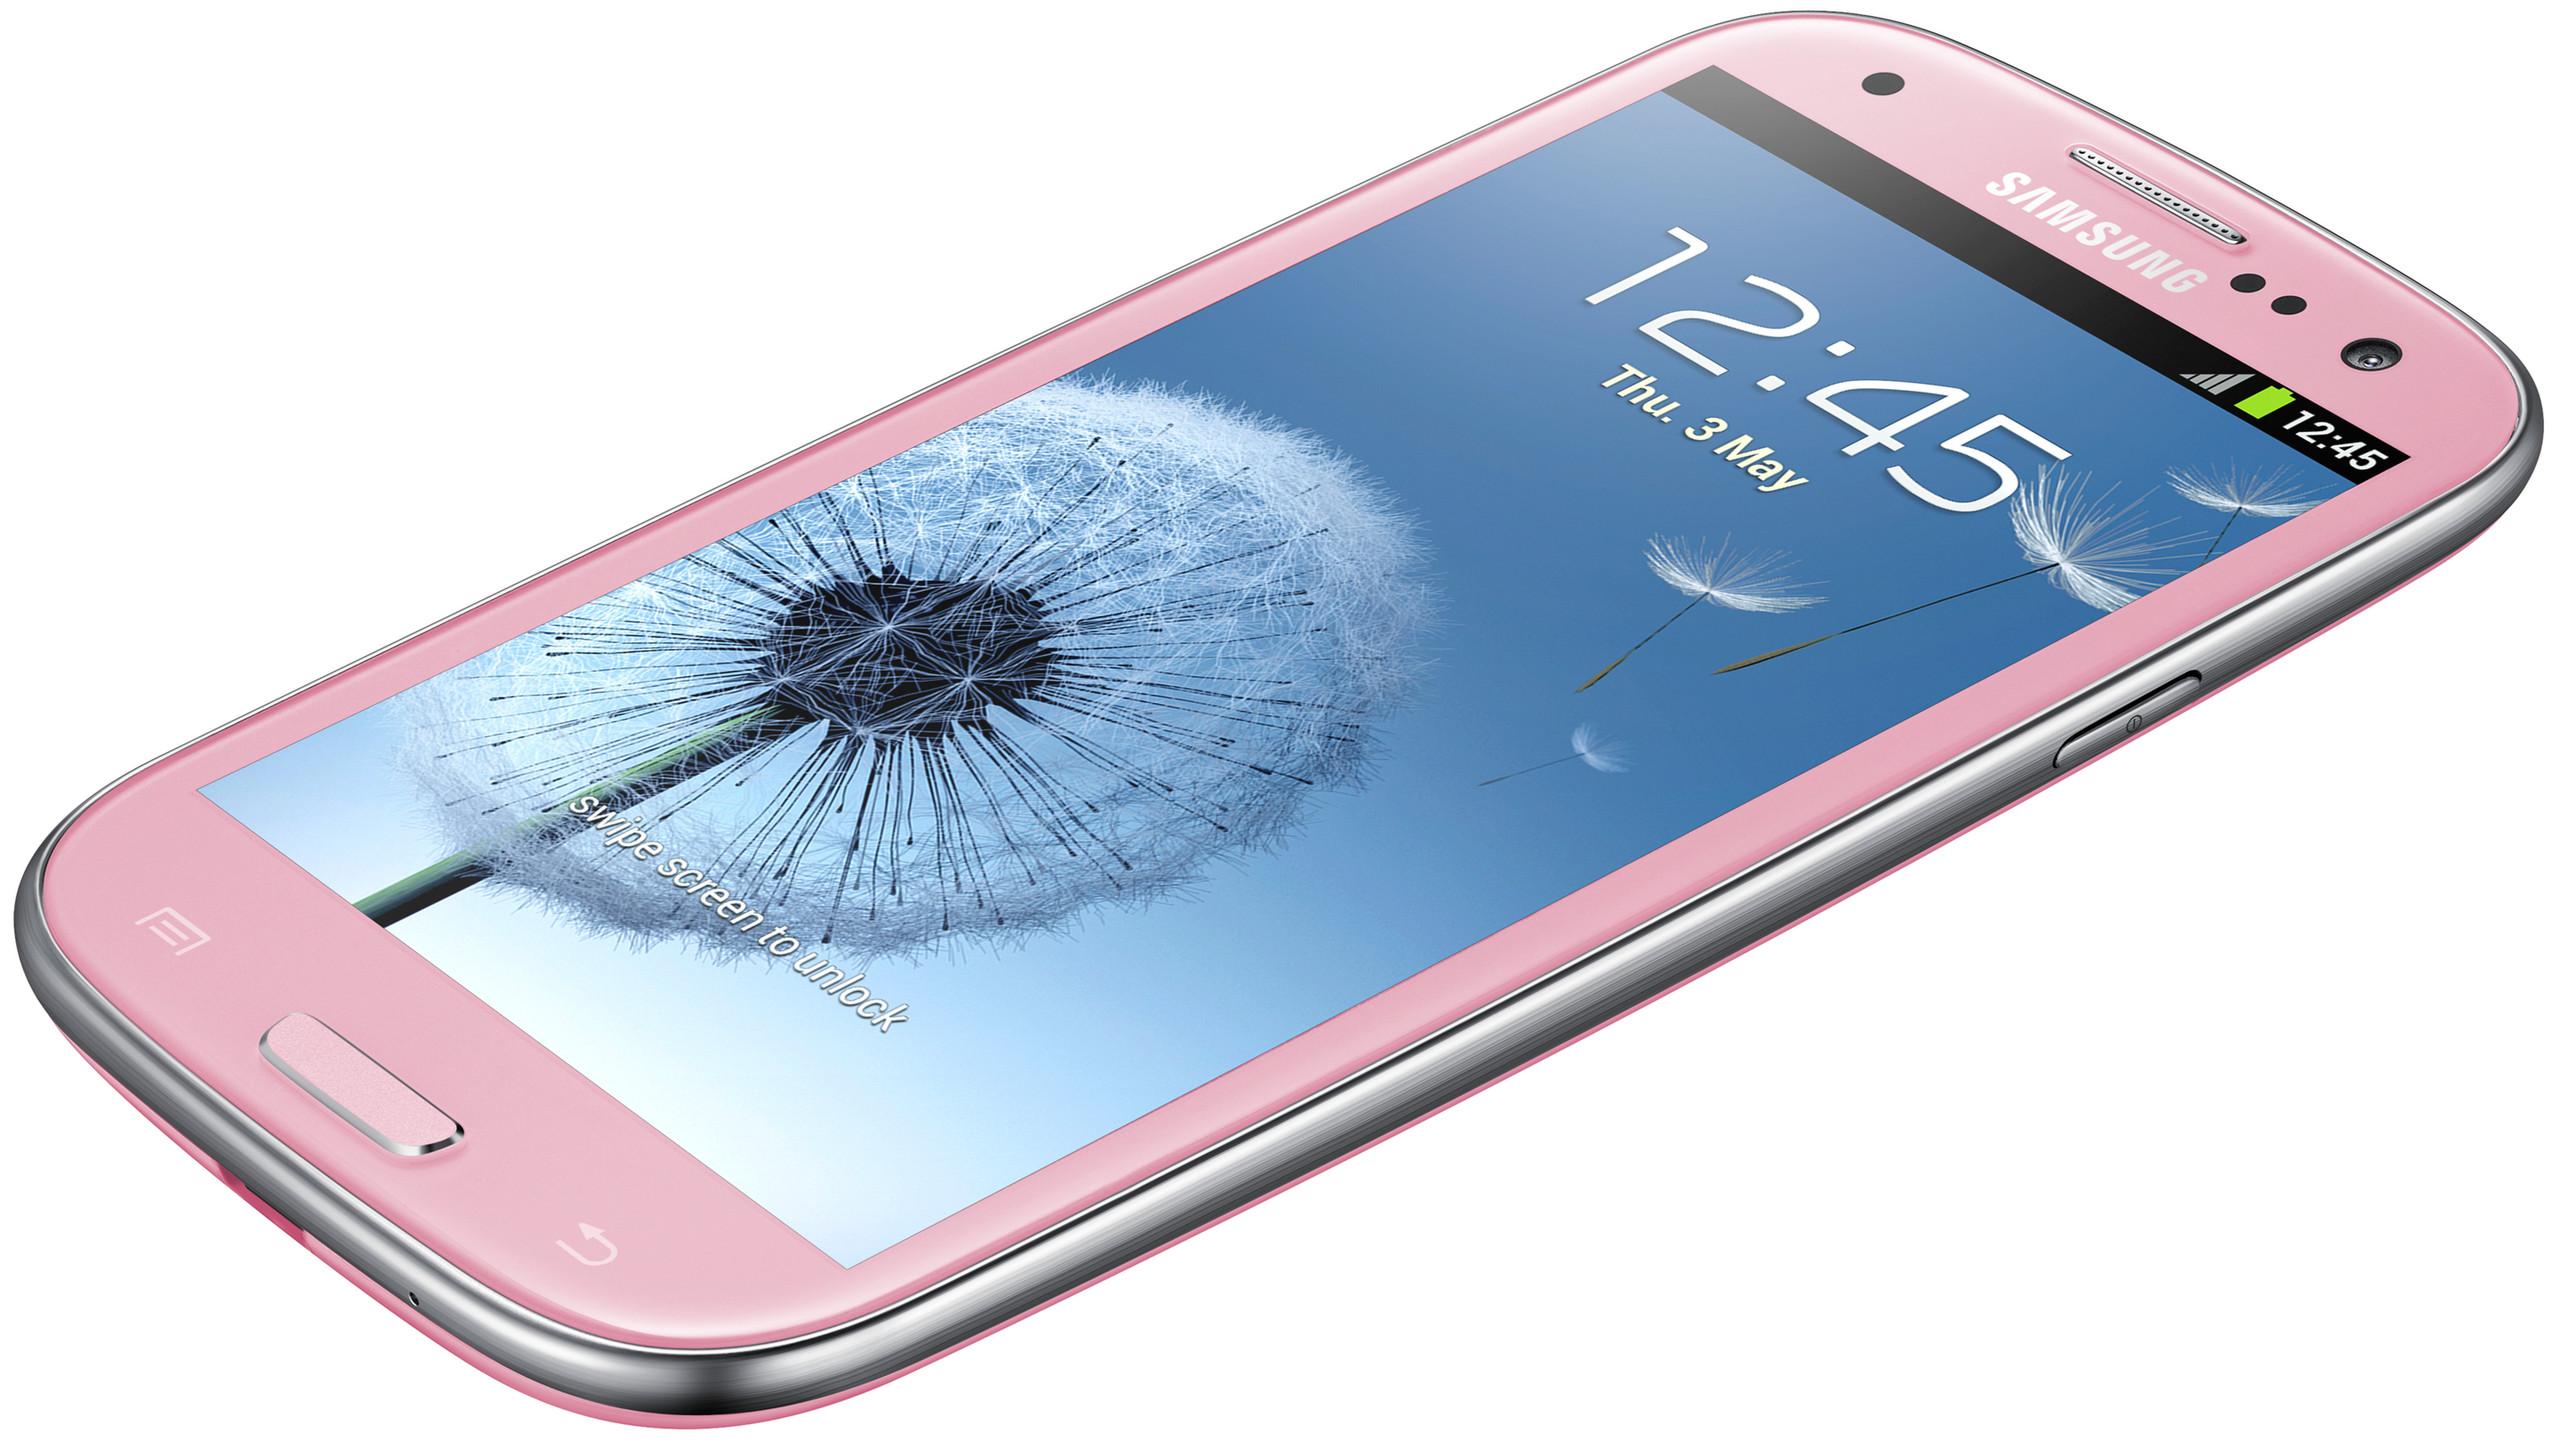 Samsung Galaxy S3 Fotmat Atma